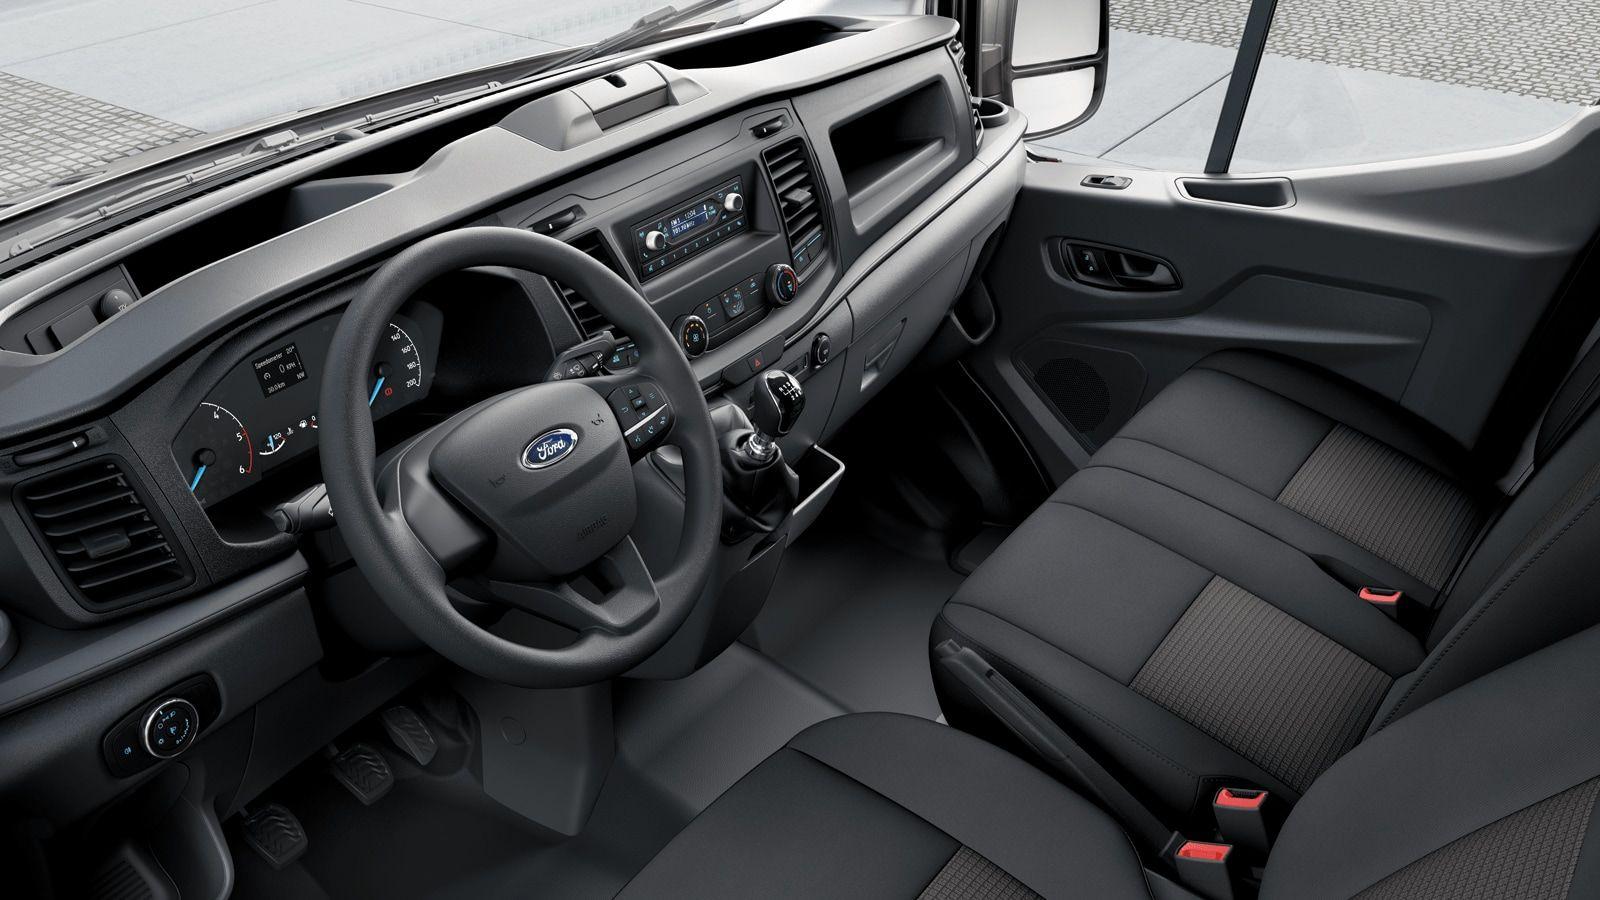 Nieuw Ford Transit 2t mca 350L Minibus L3 Trend mHEVM6 2.0 TD 130 pk M1 Euro 6.2 AXW - niet-metaalkleur: Frozen White 5